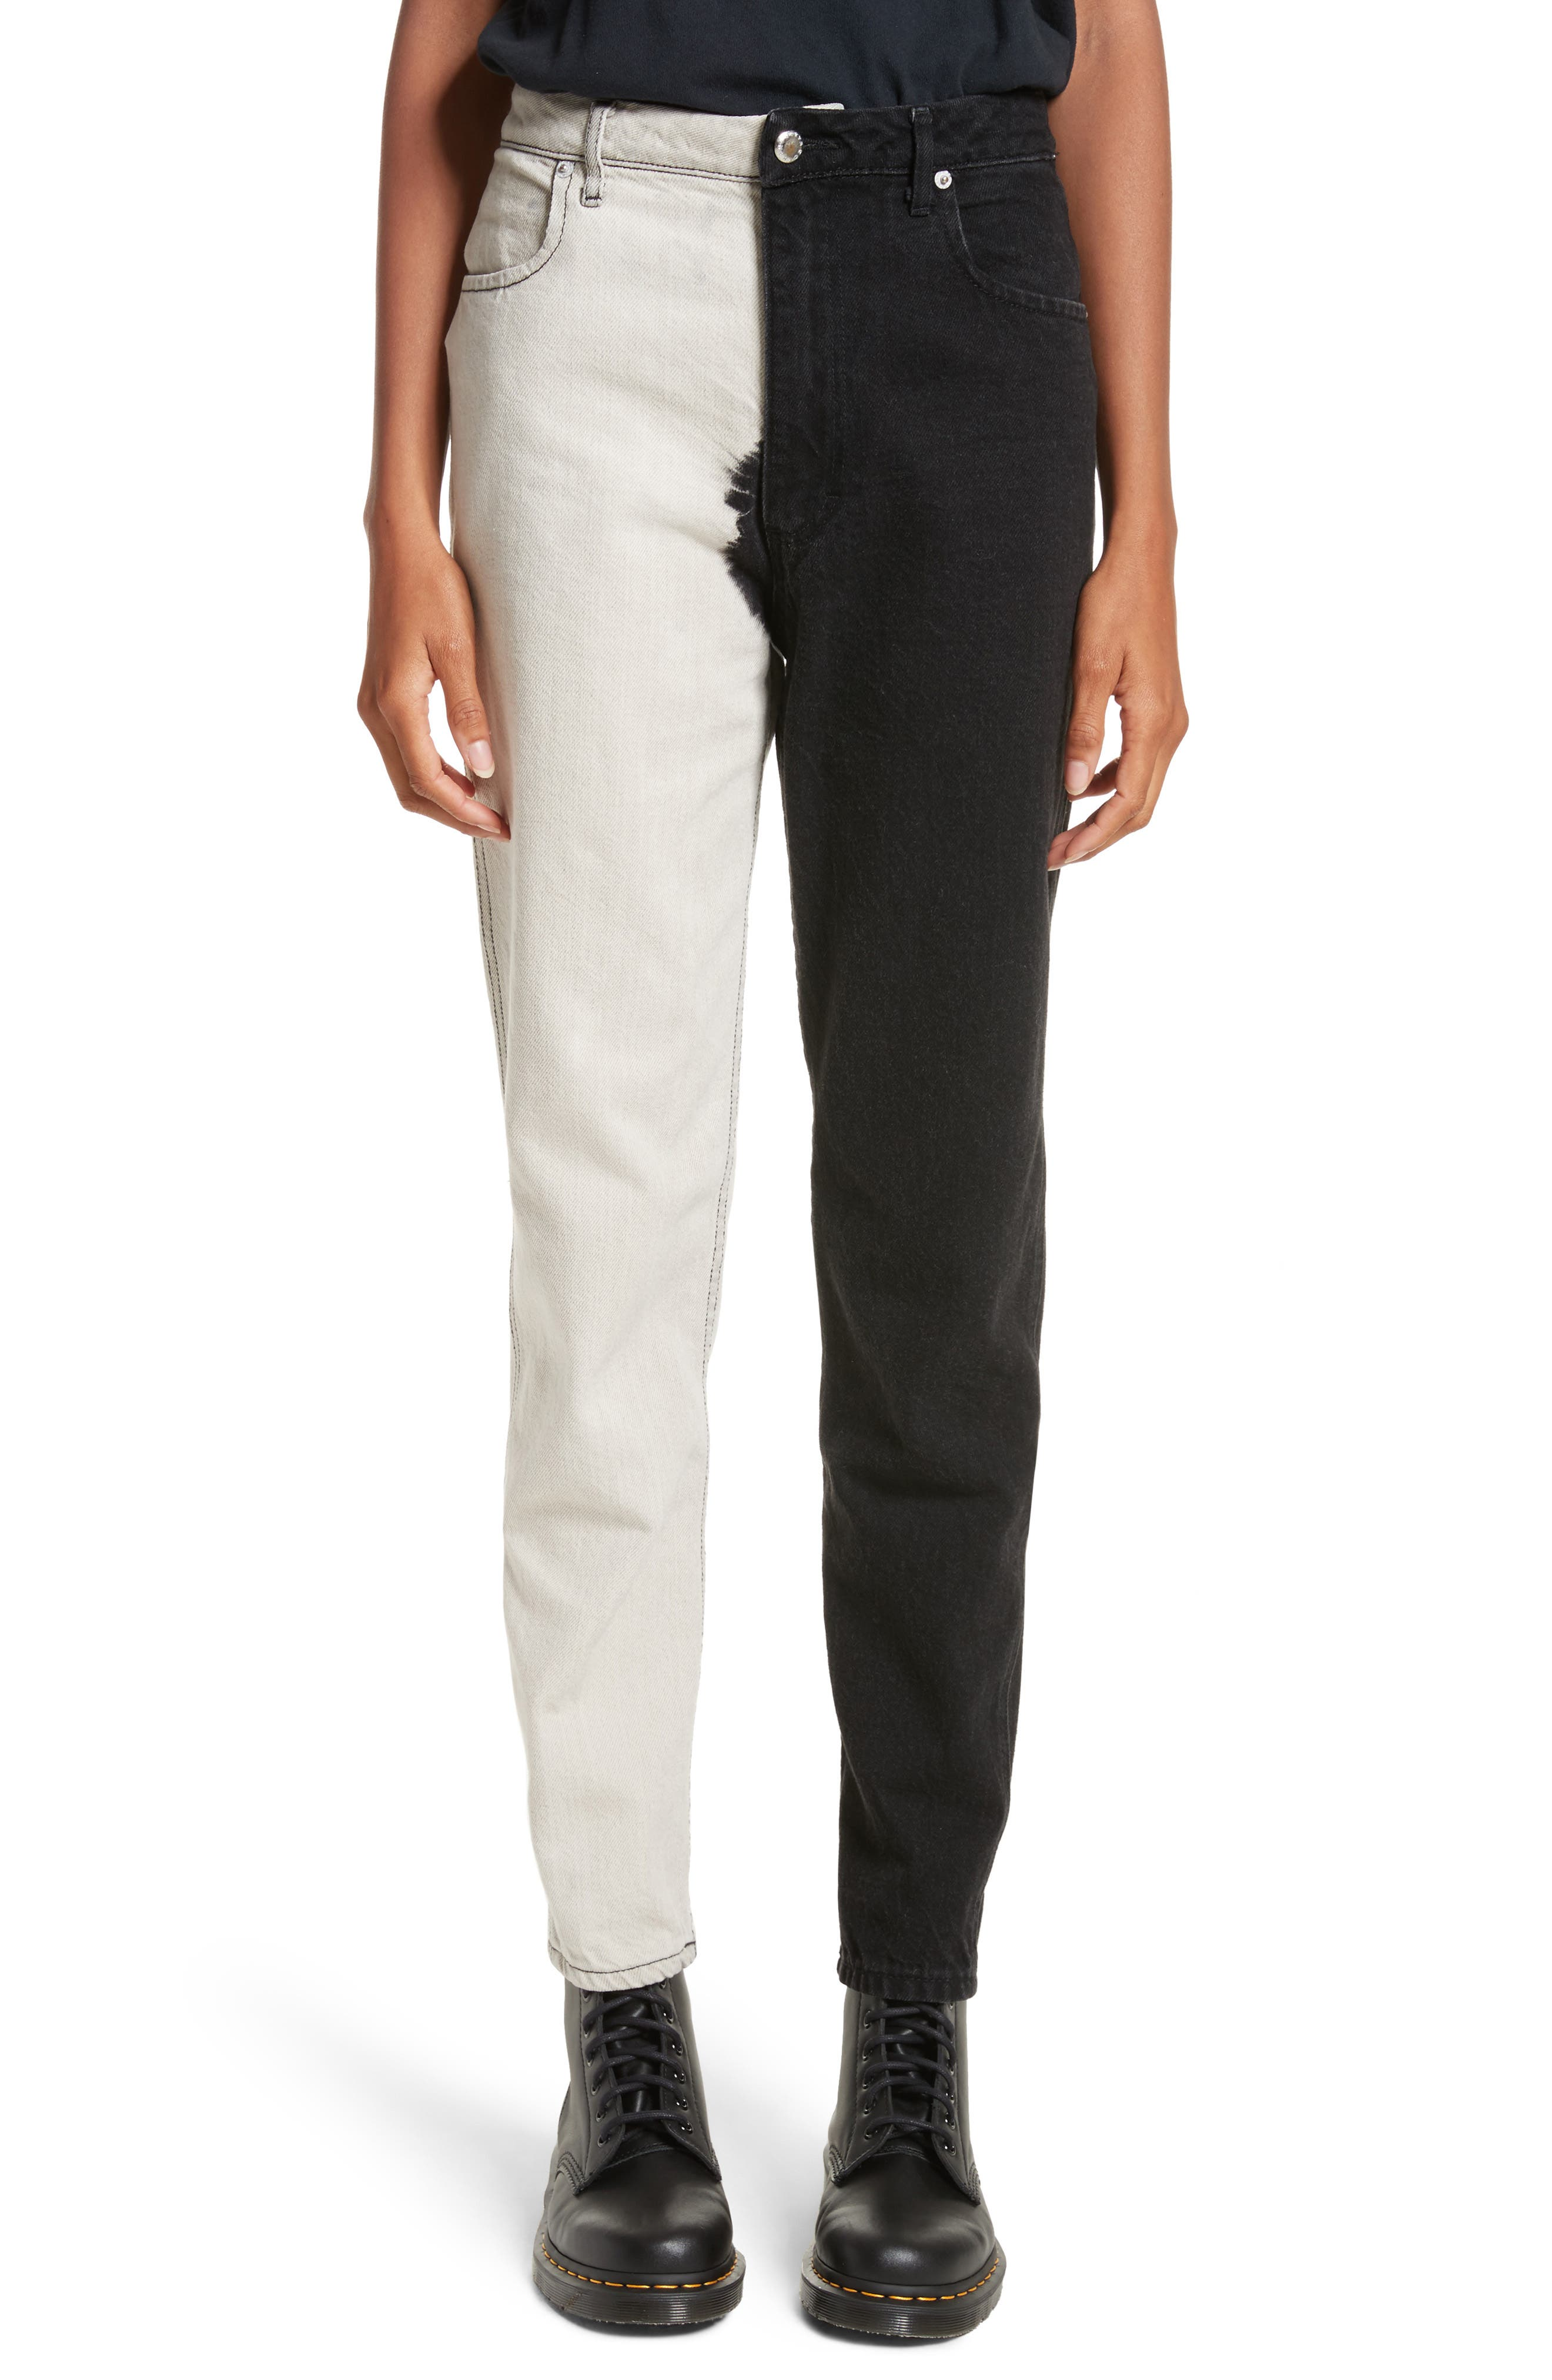 Echkaus Latta EL Dip Dyed Jeans (Black & White)